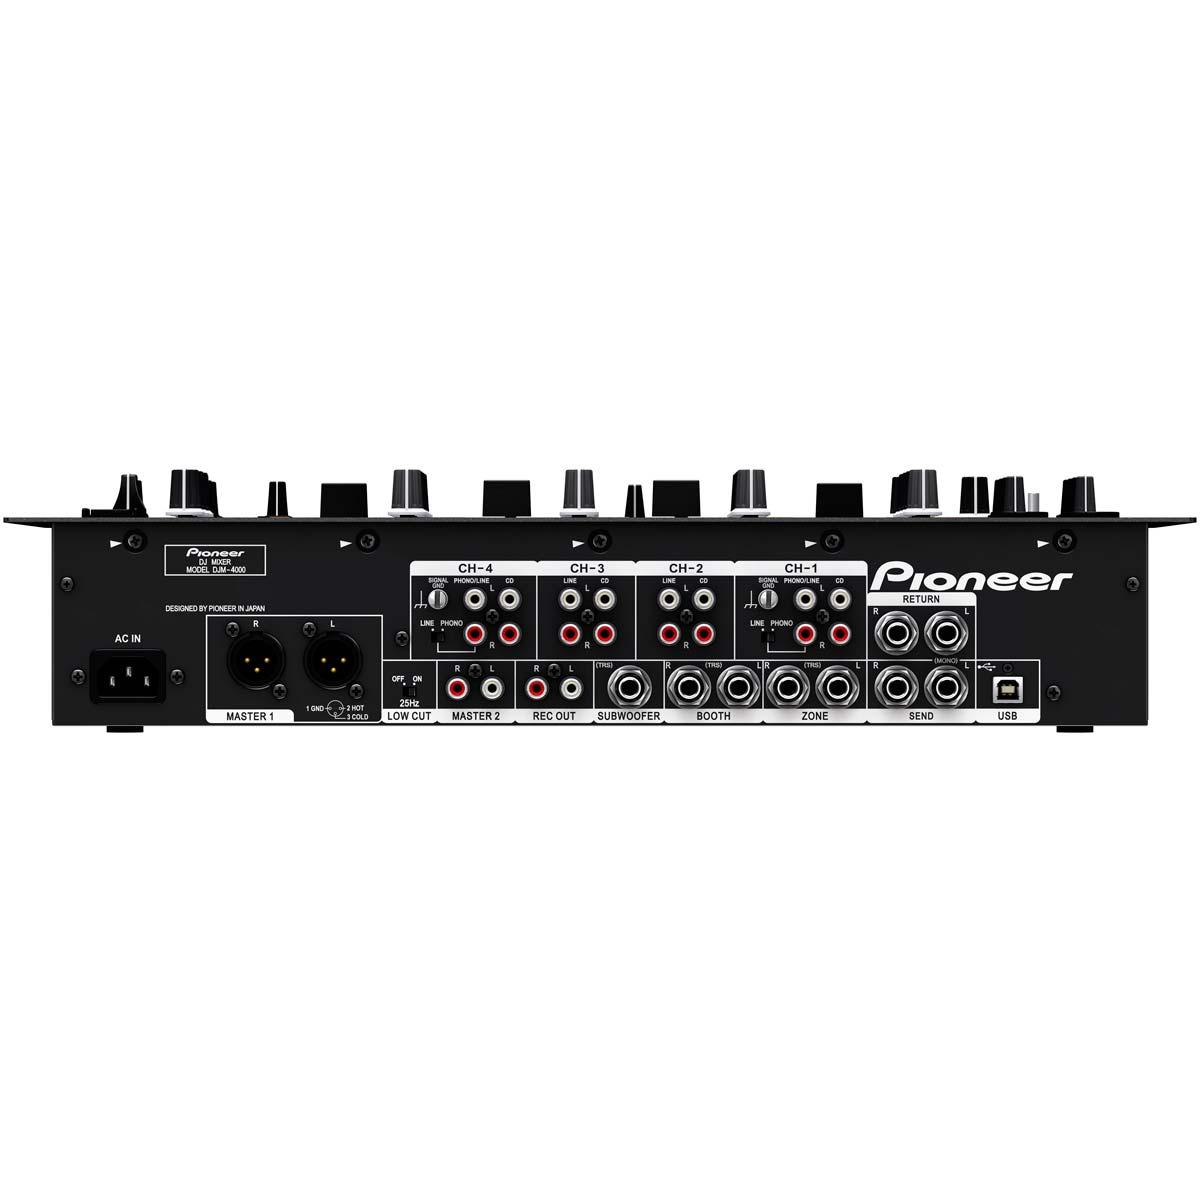 DJM4000 - Mixer DJ 4 Canais Preto DJM 4000 - Pioneer